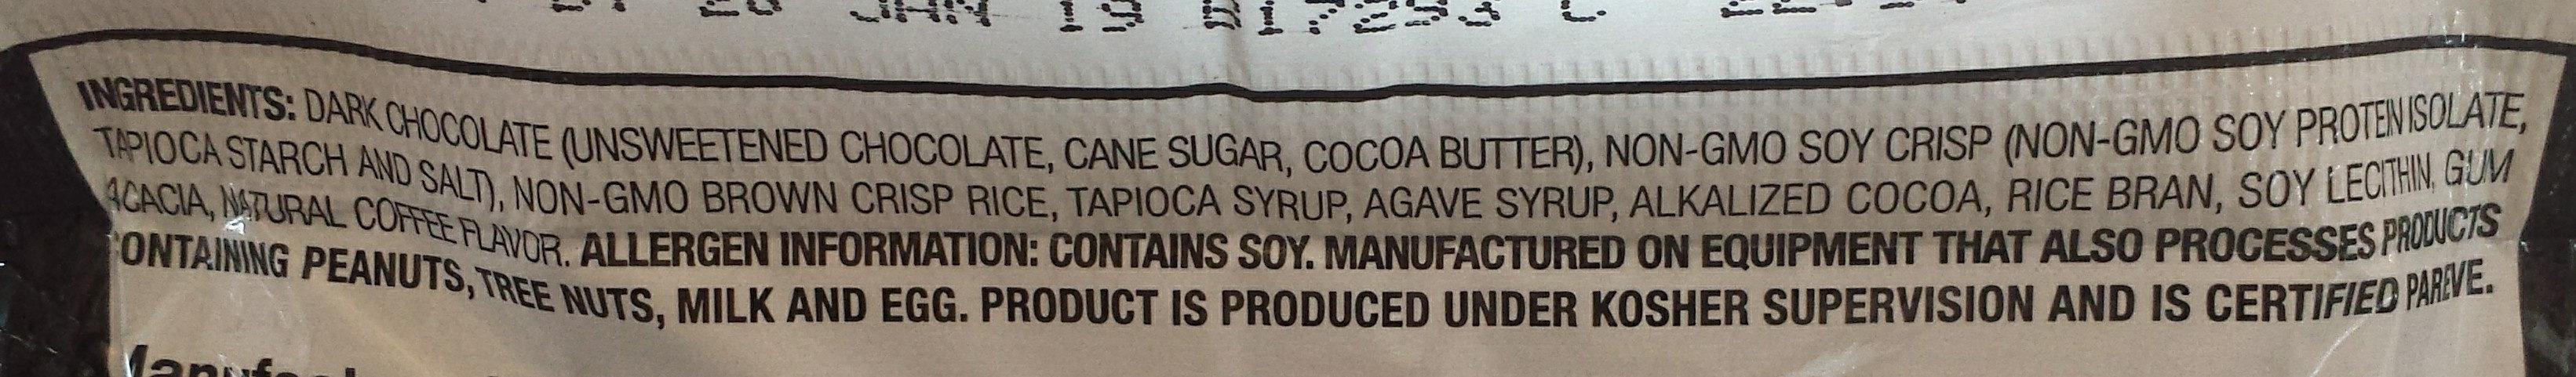 Real Dark Chocolate Protein Bar - Ingredients